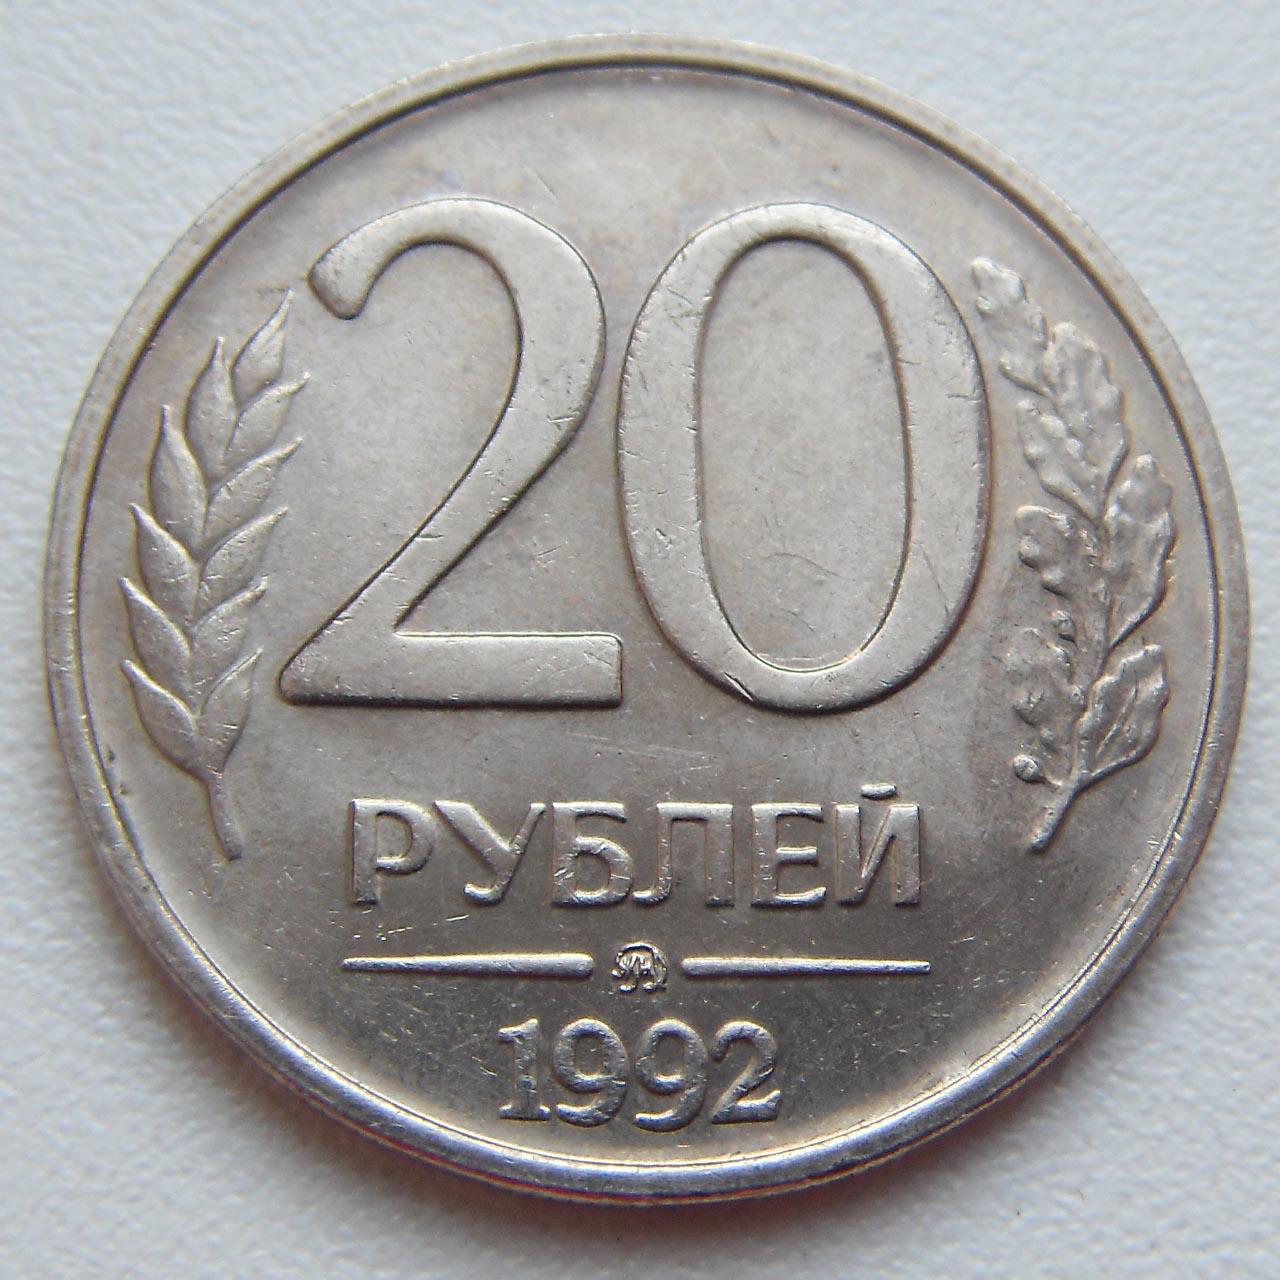 С 1992 года замена купюр 500 евро